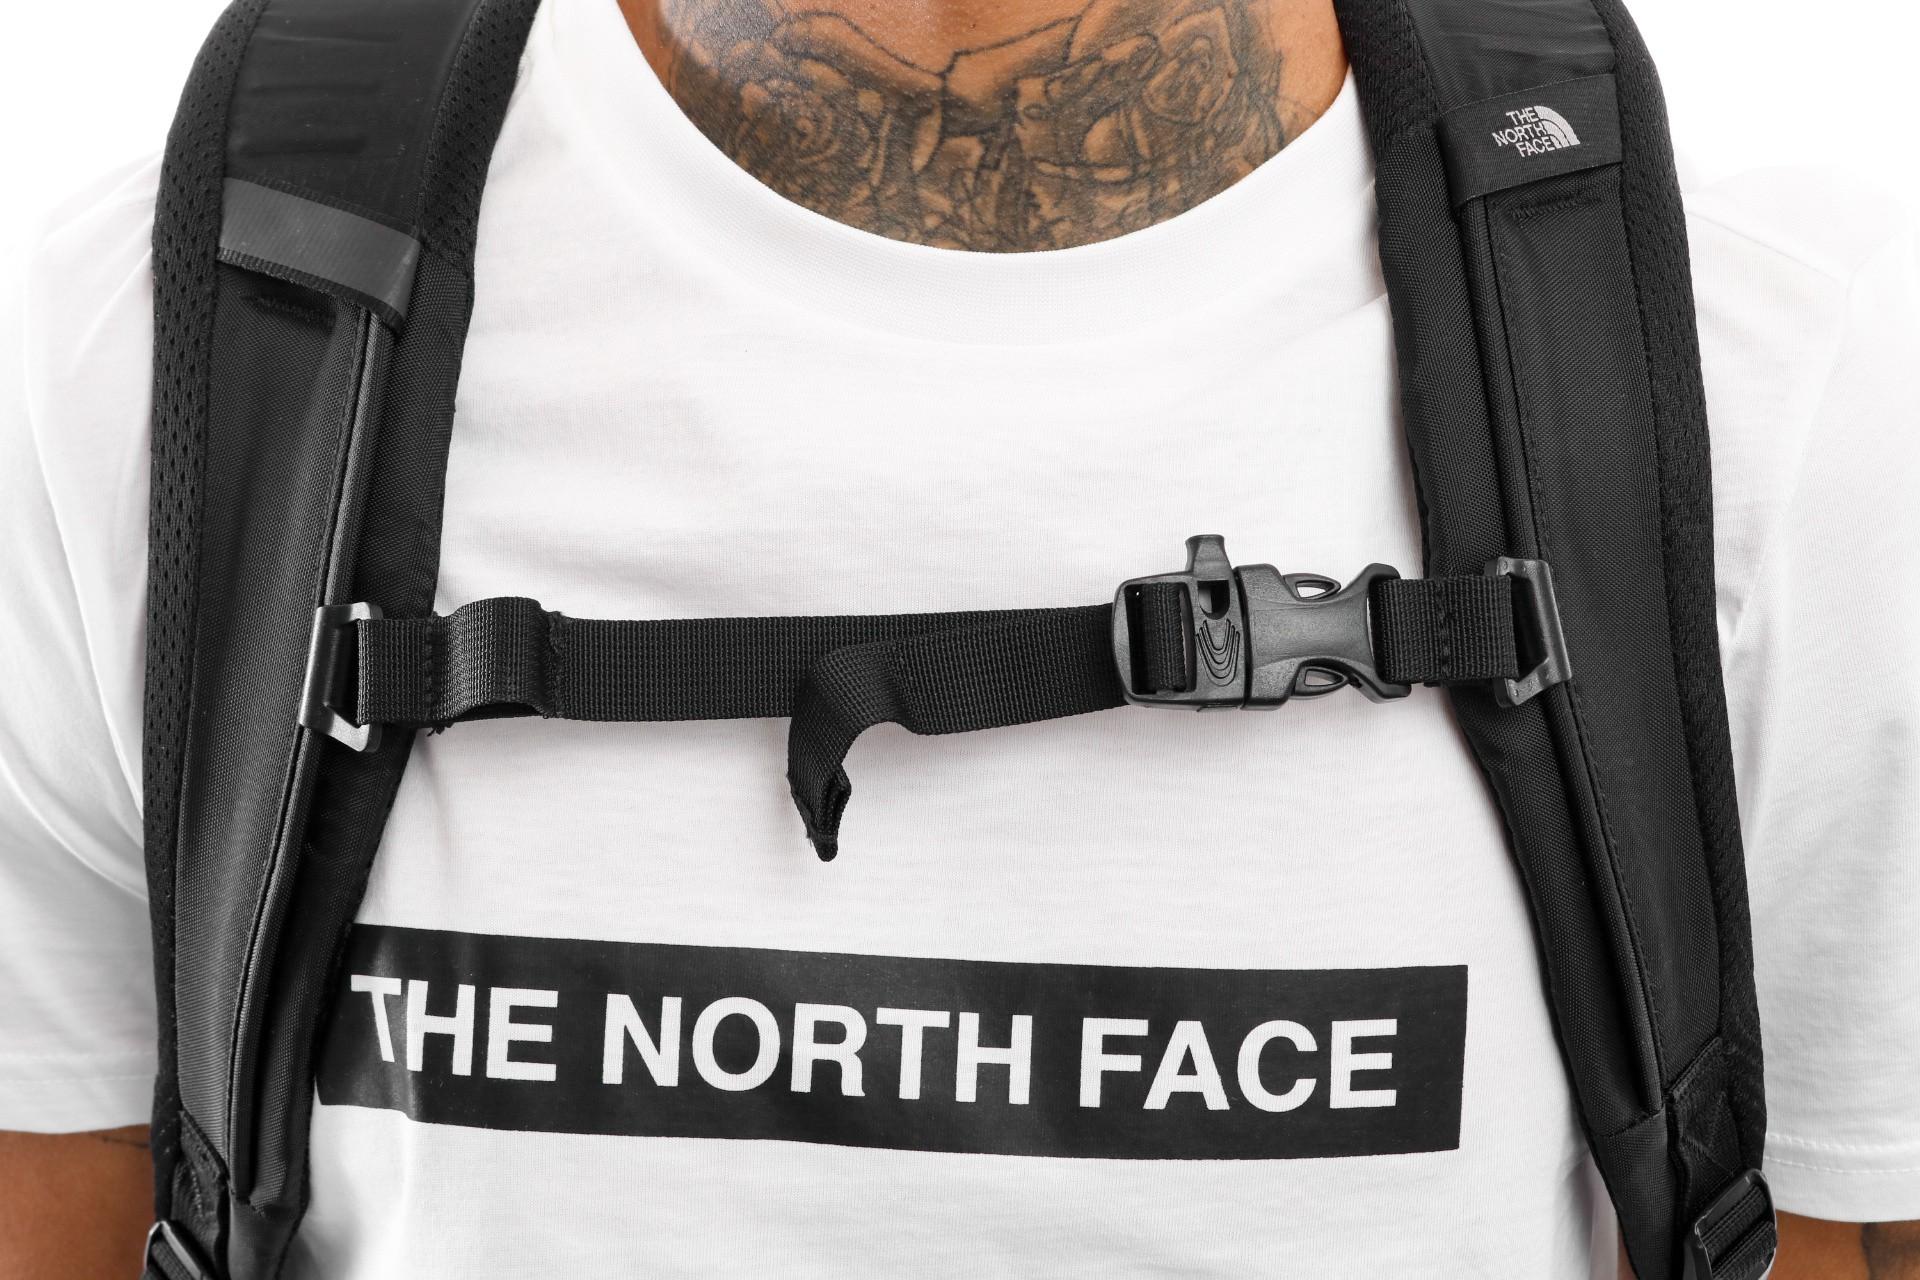 Afbeelding van The North Face T93KV1-JK3 Rugzak Recon Black